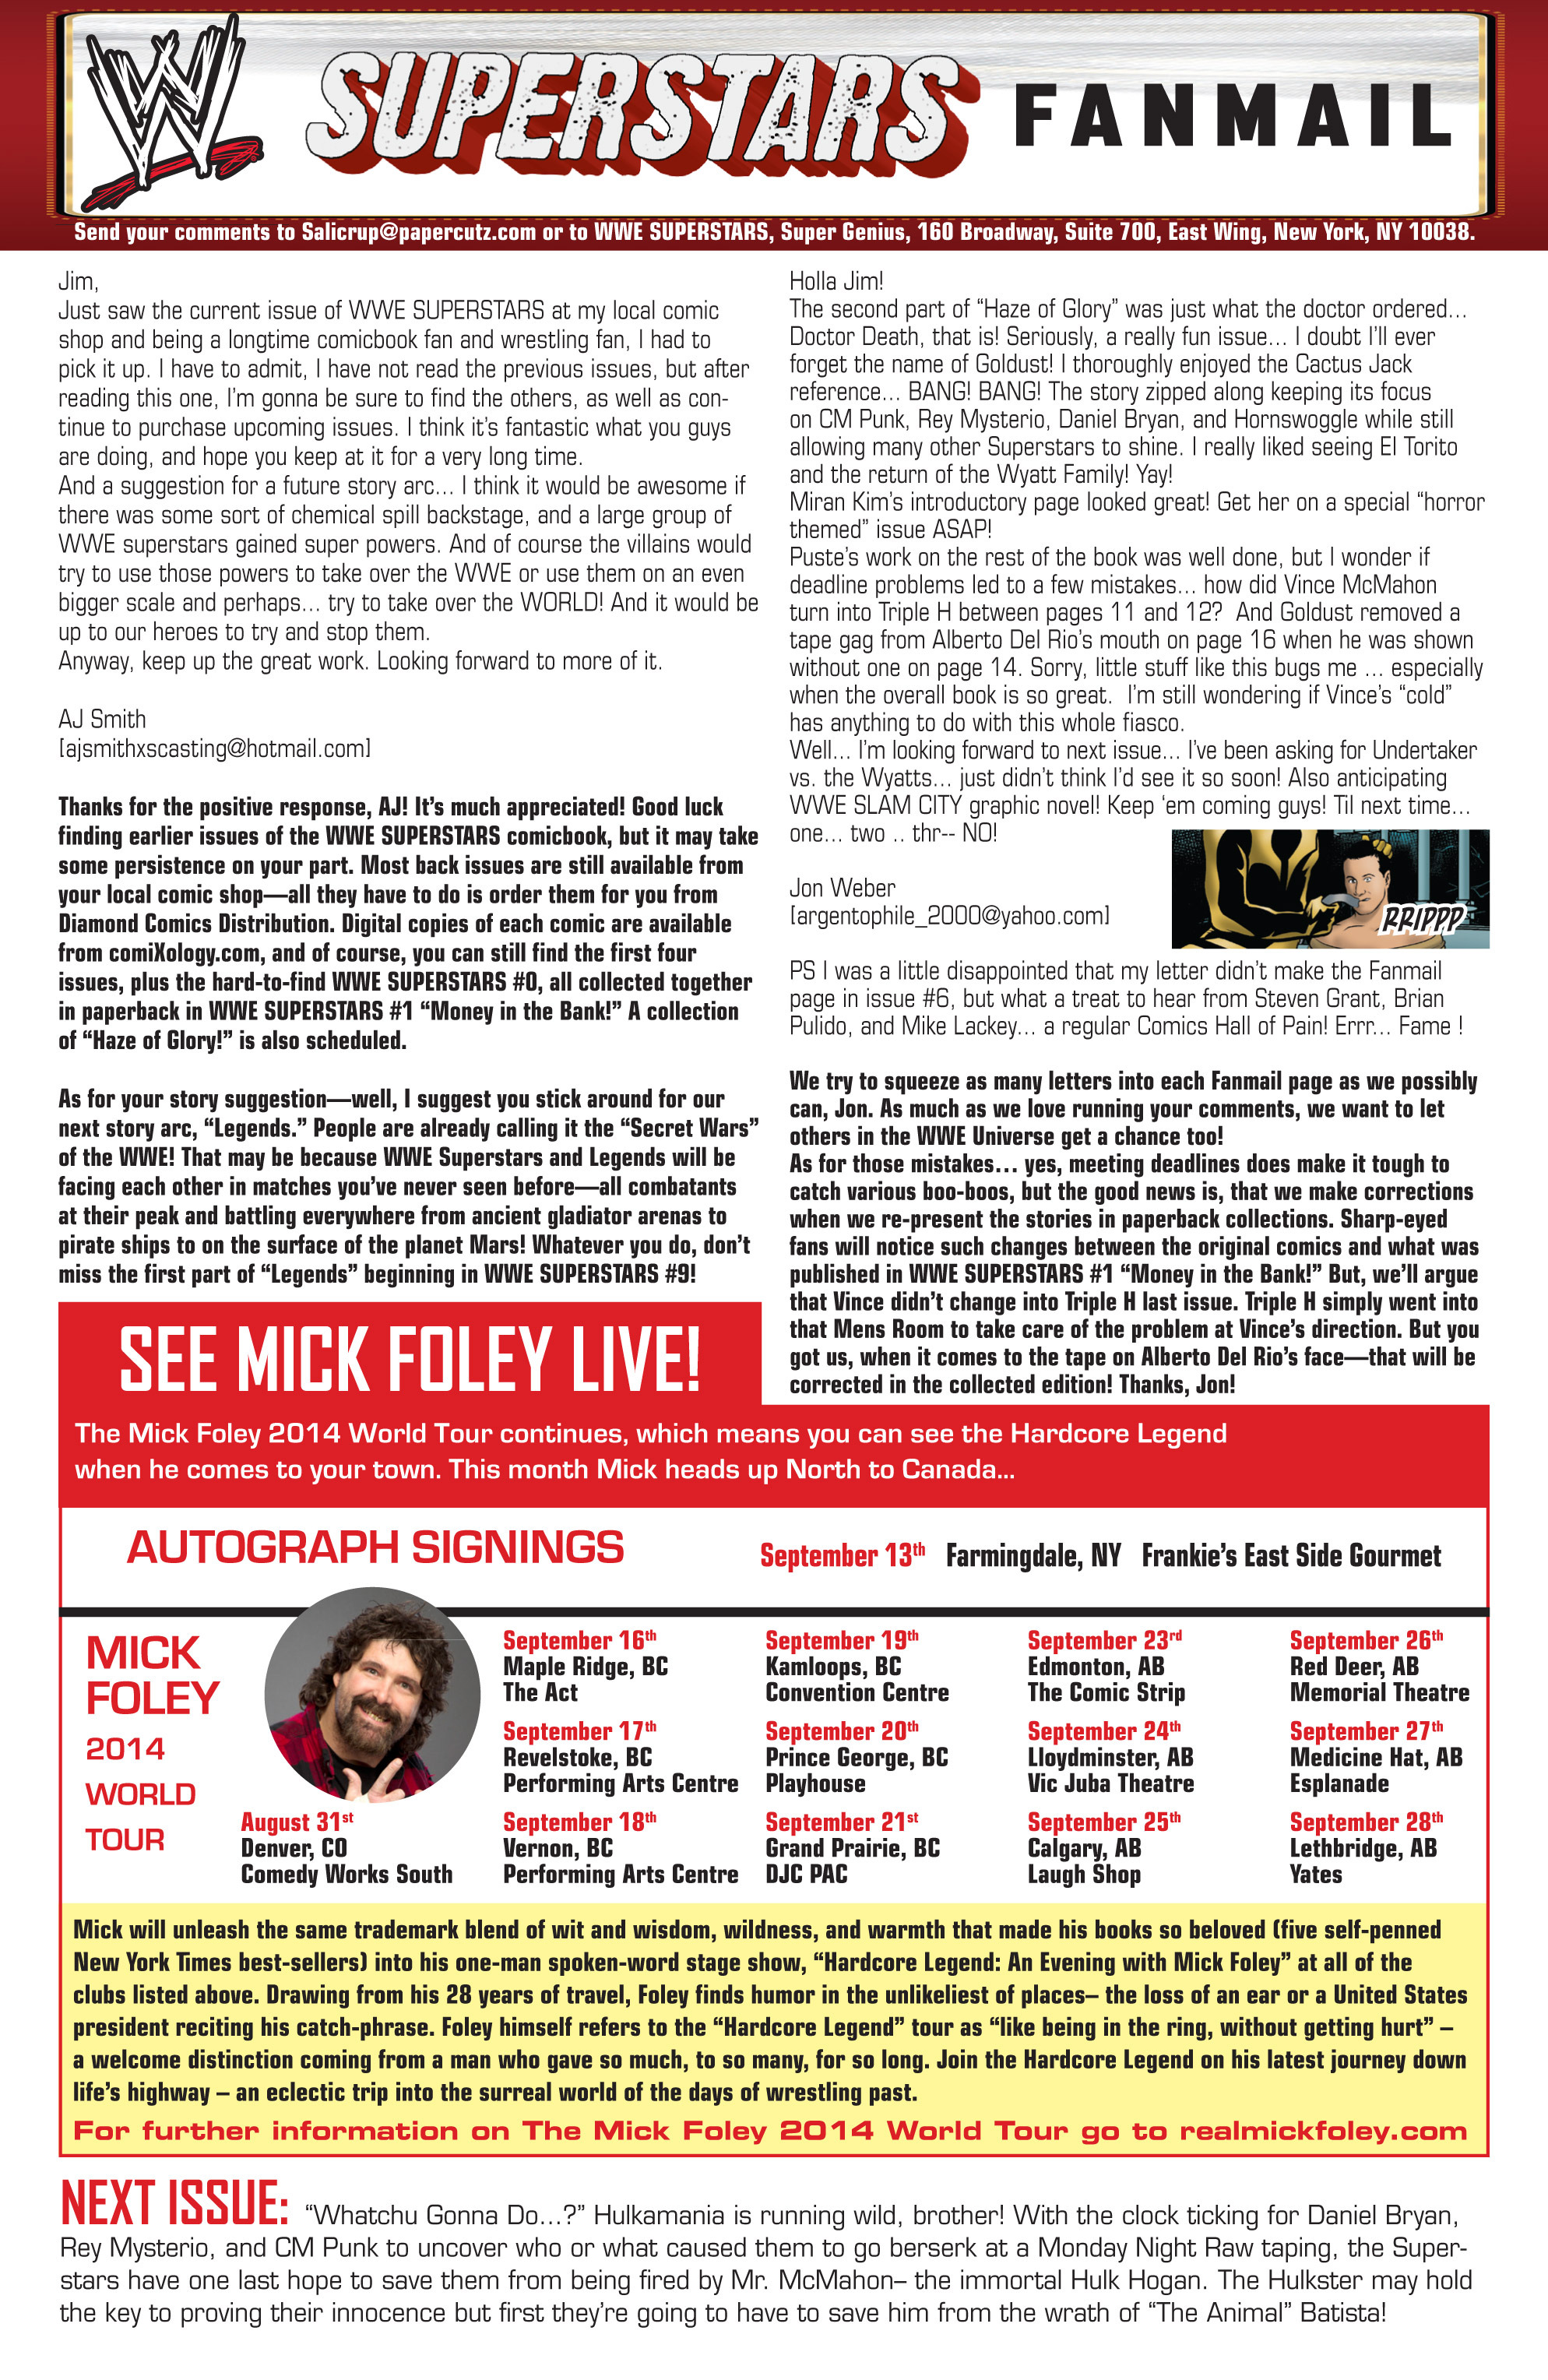 Read online WWE Superstars comic -  Issue #7 - 28